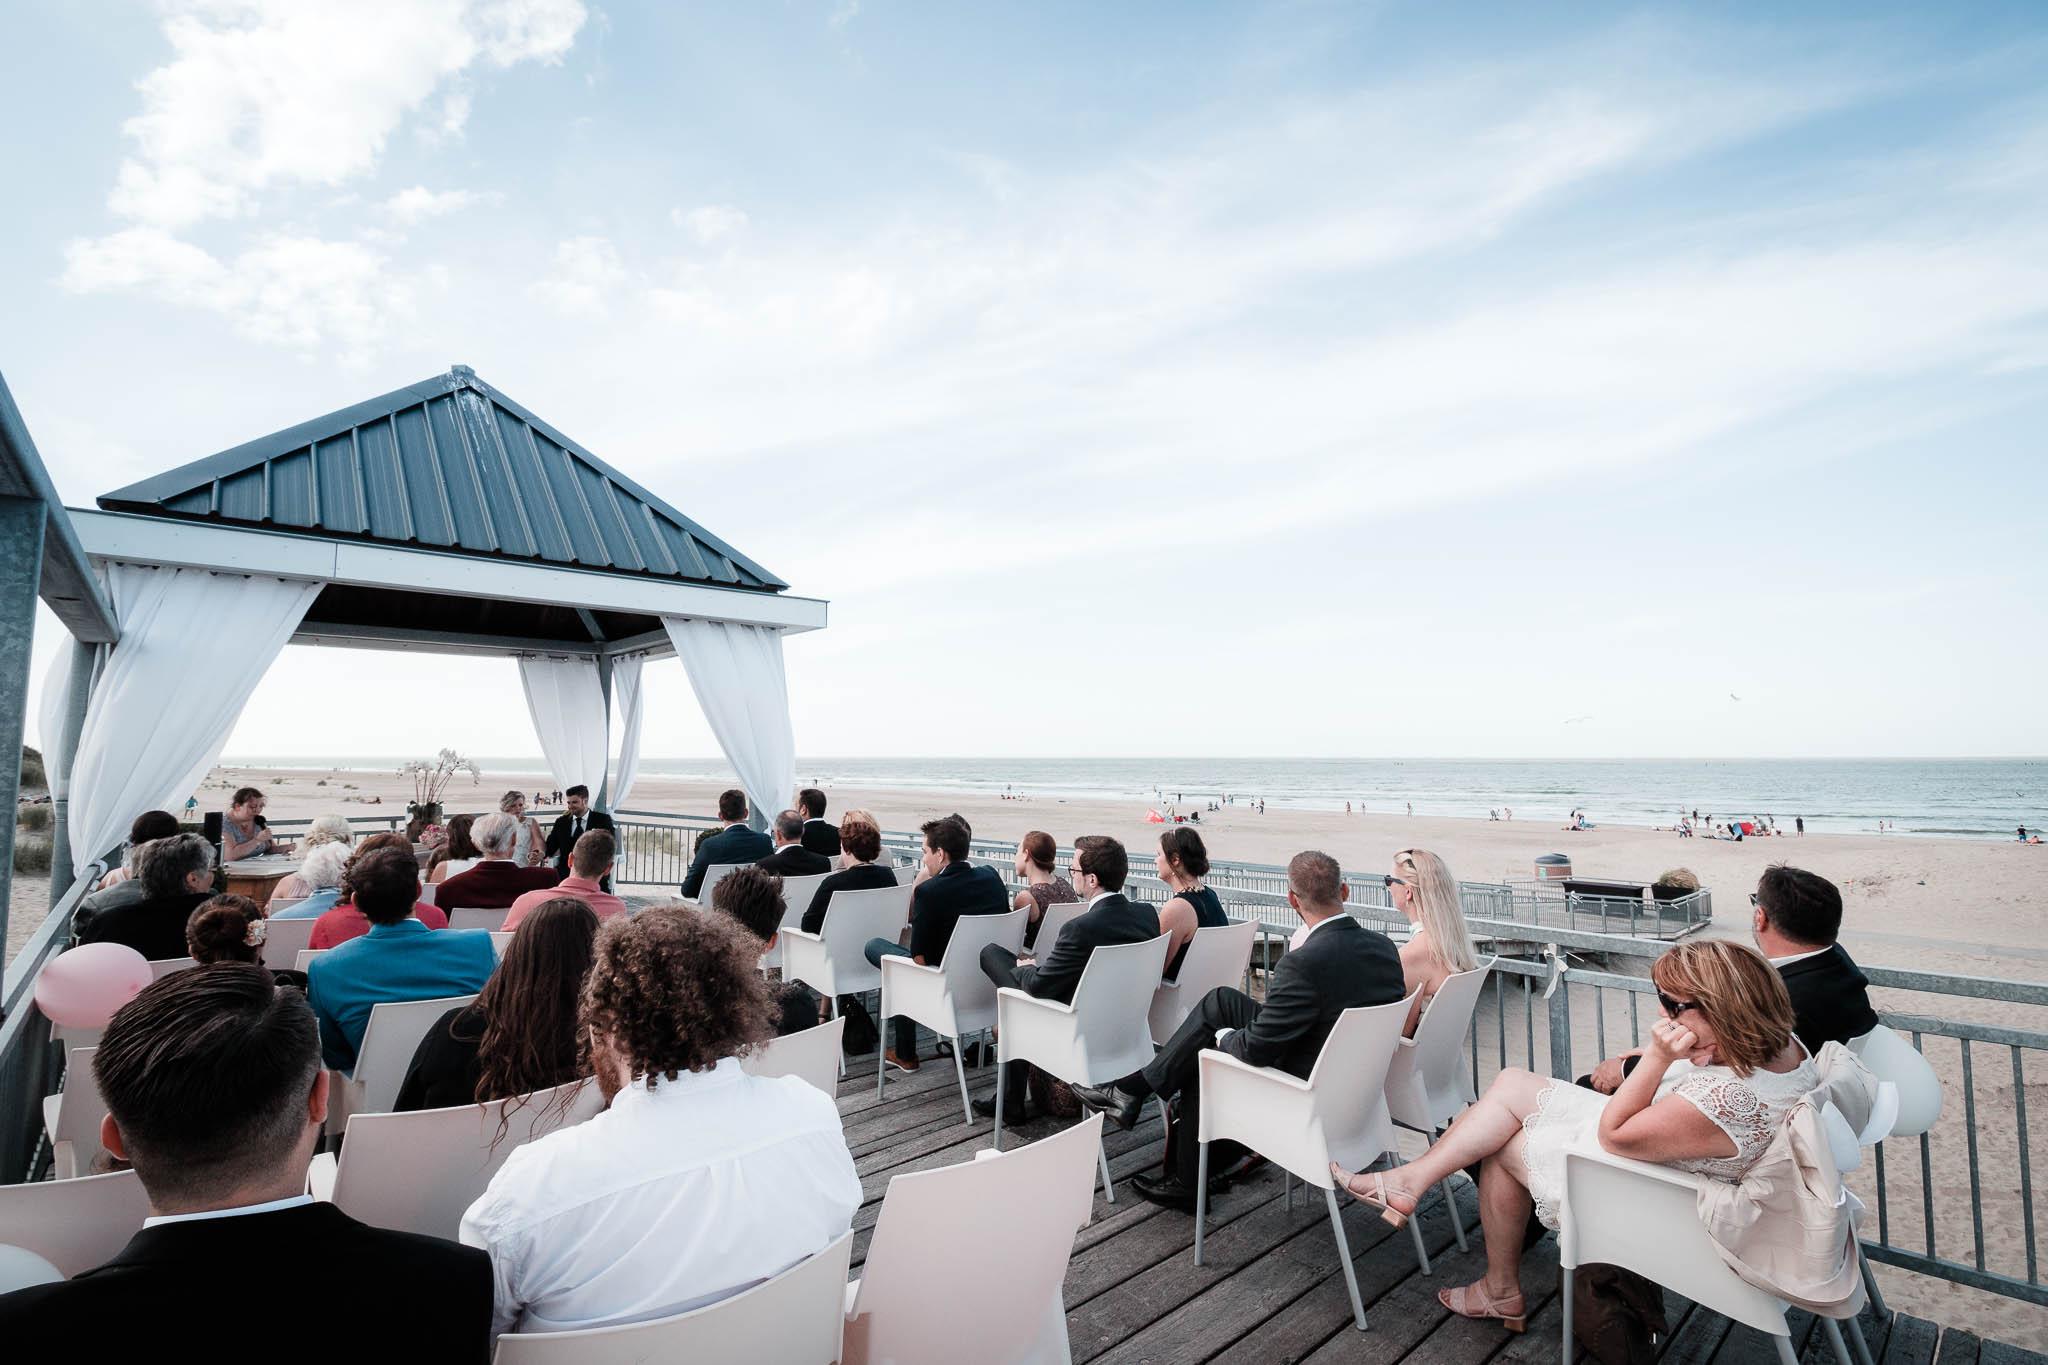 Freie Trauung Holland, Renesse - am Strand 17